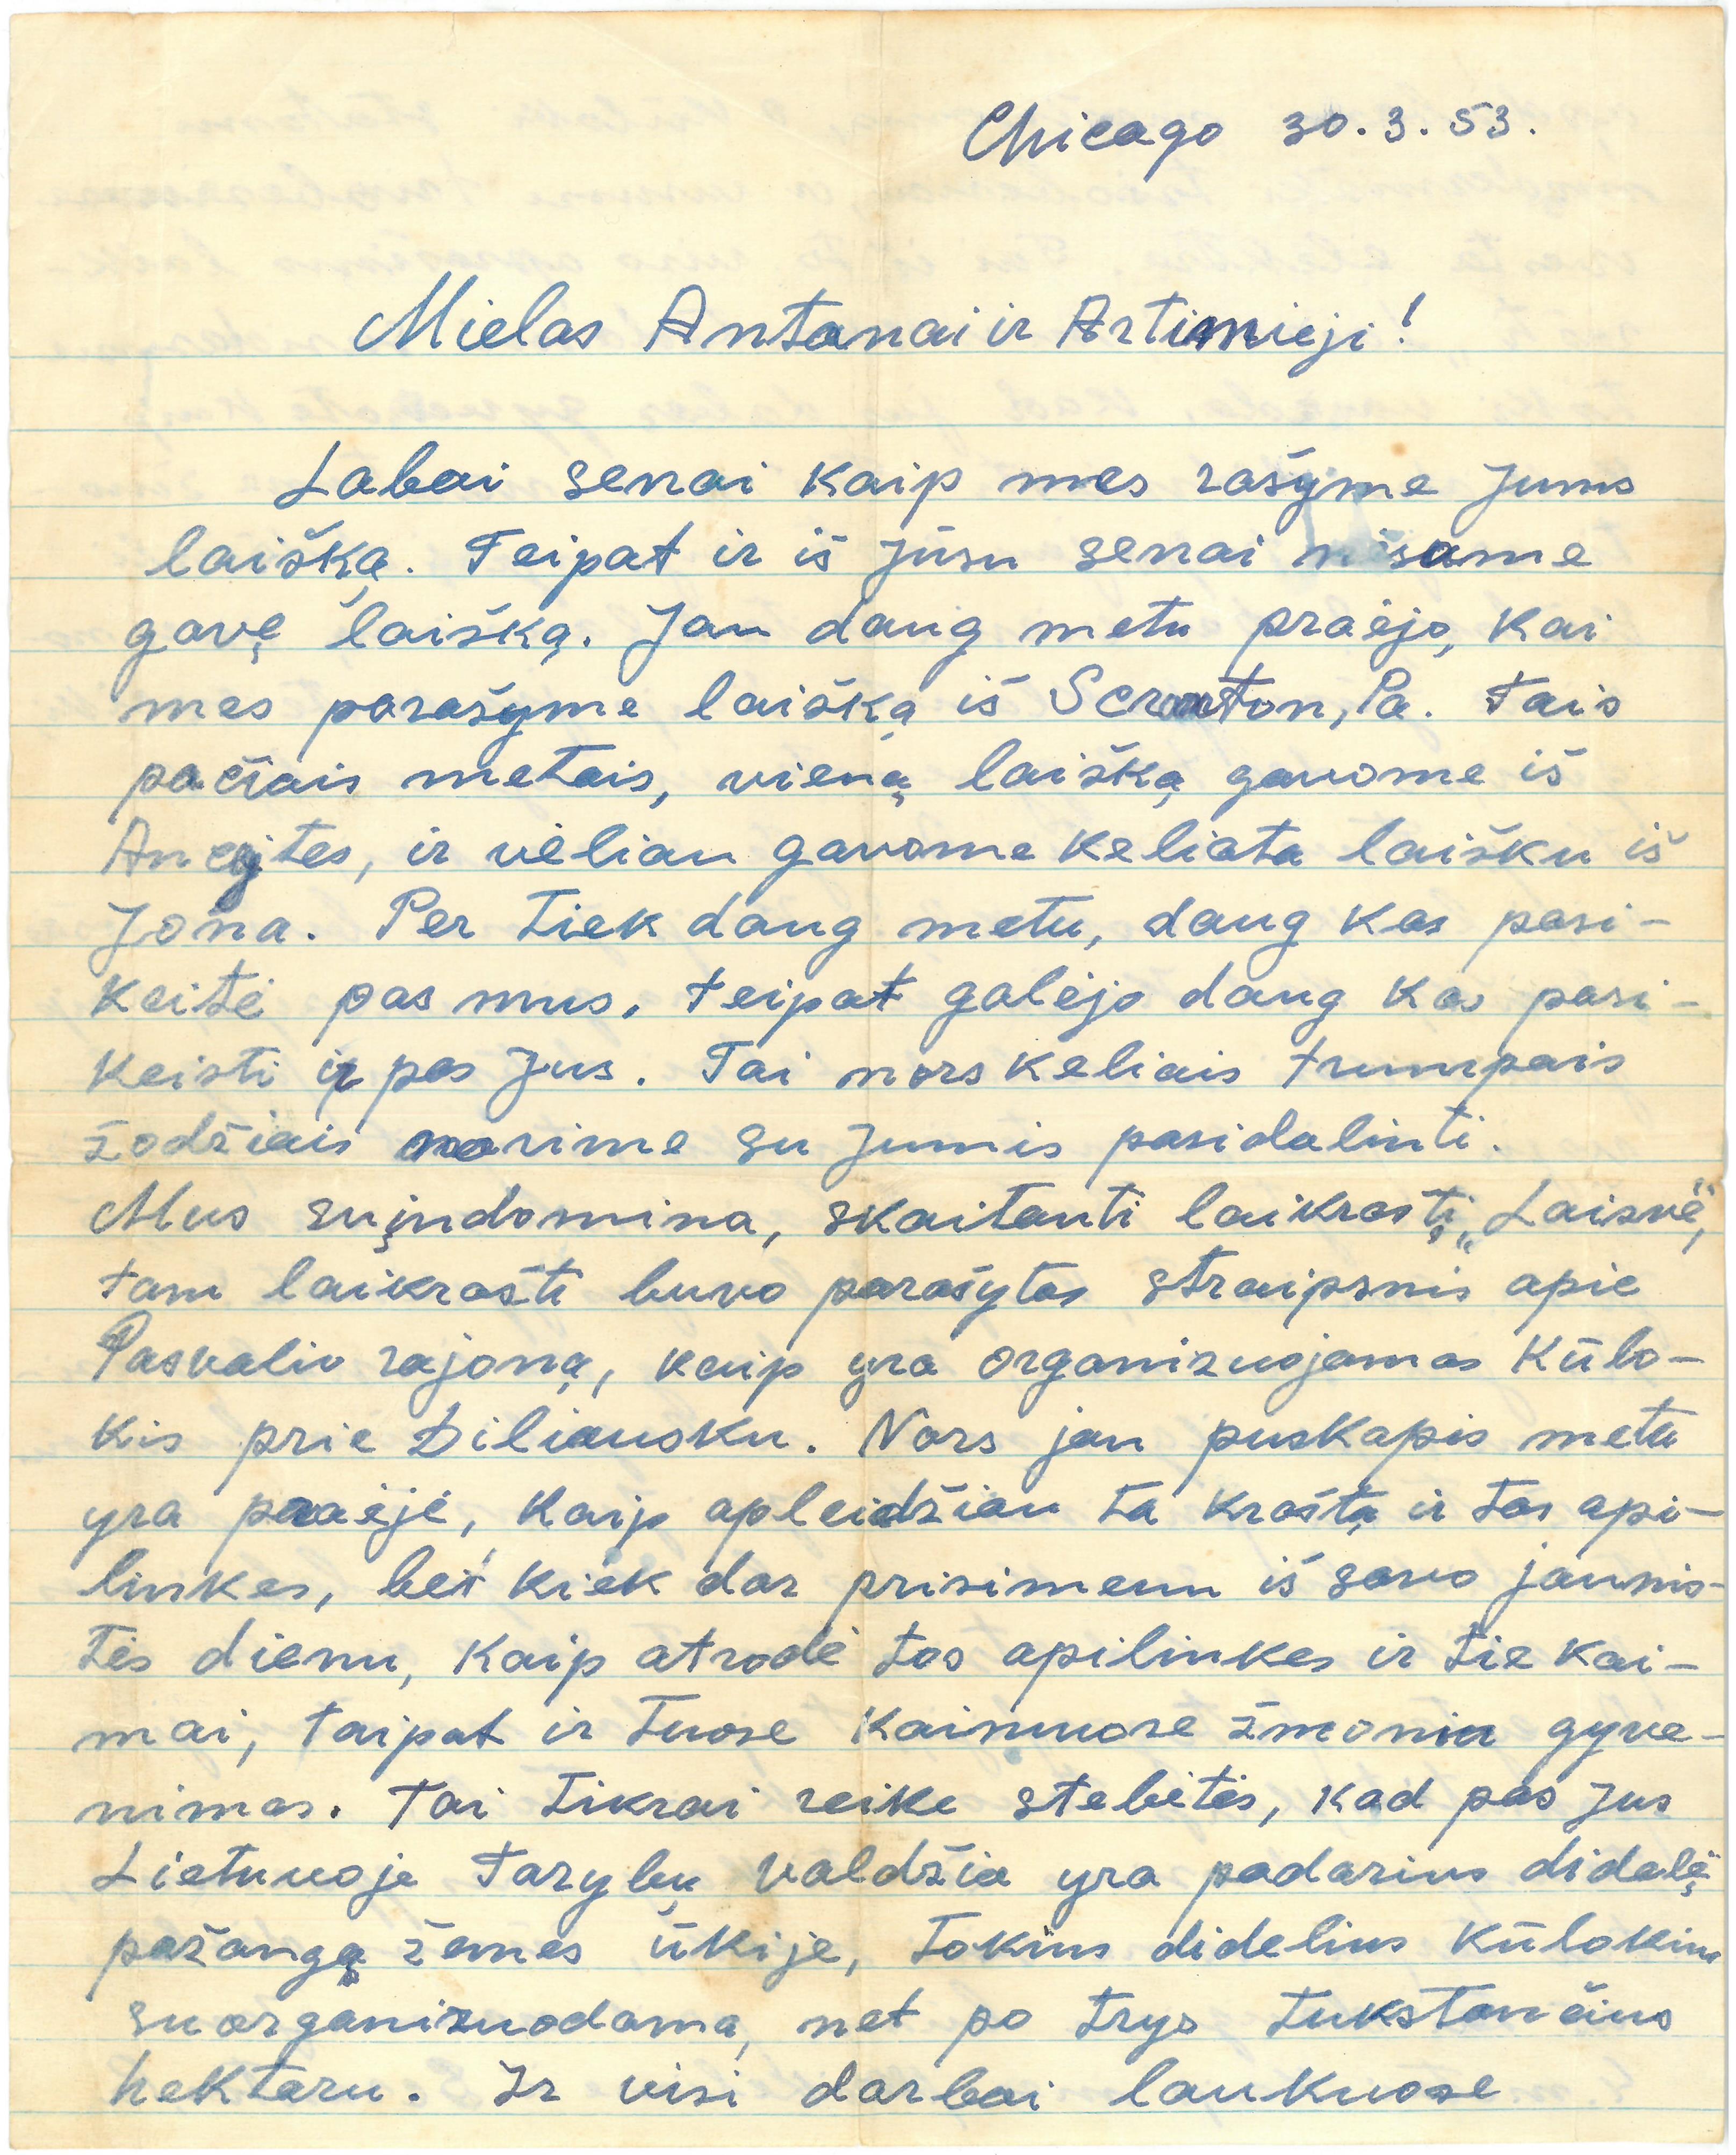 Kazio Balčiūno (slapyv. K. Chesek) laiškas  artimiesiems. 1953 m. kovo 30 d.